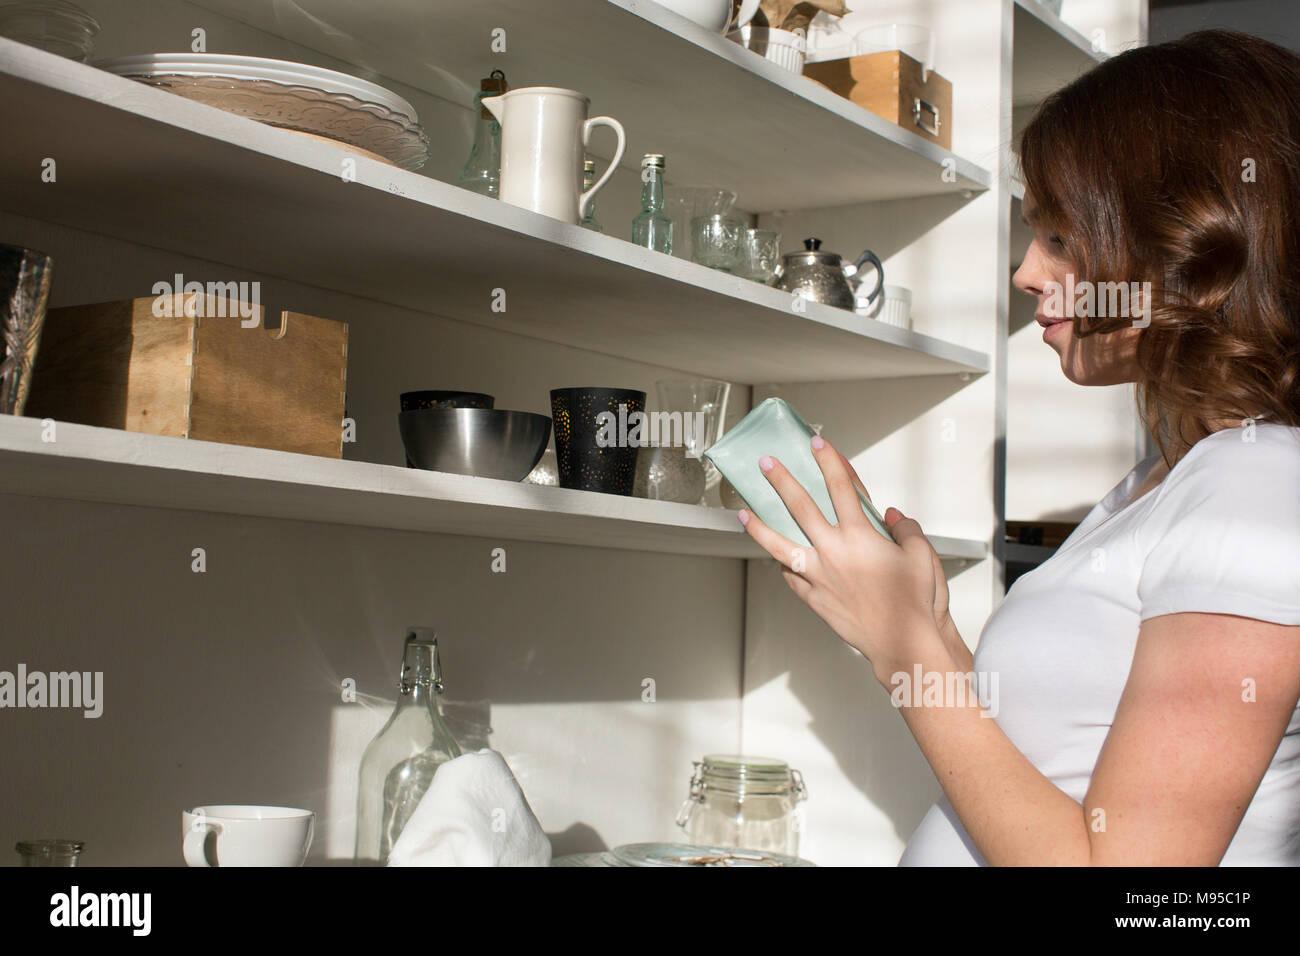 Female taking box from shelf - Stock Image